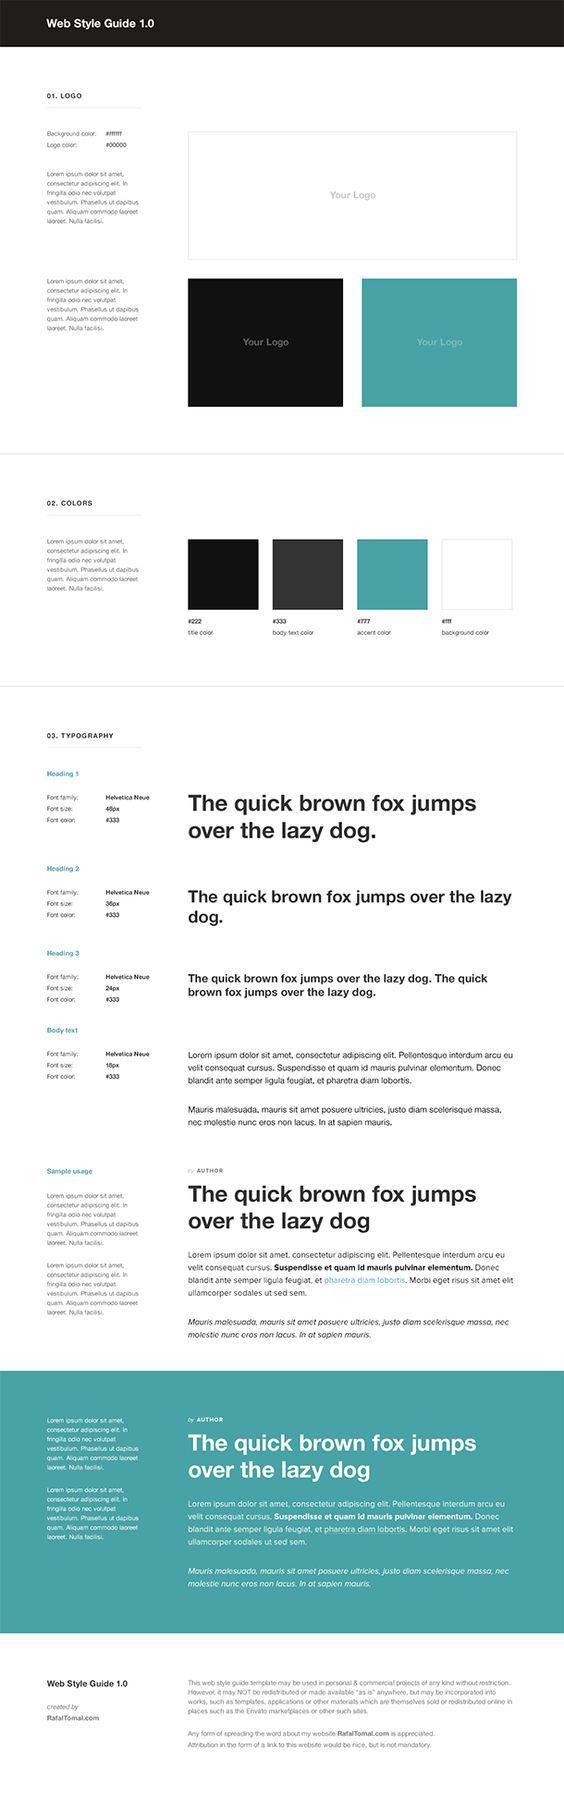 Web Style Guide Template RafalTomal – Guide Templates